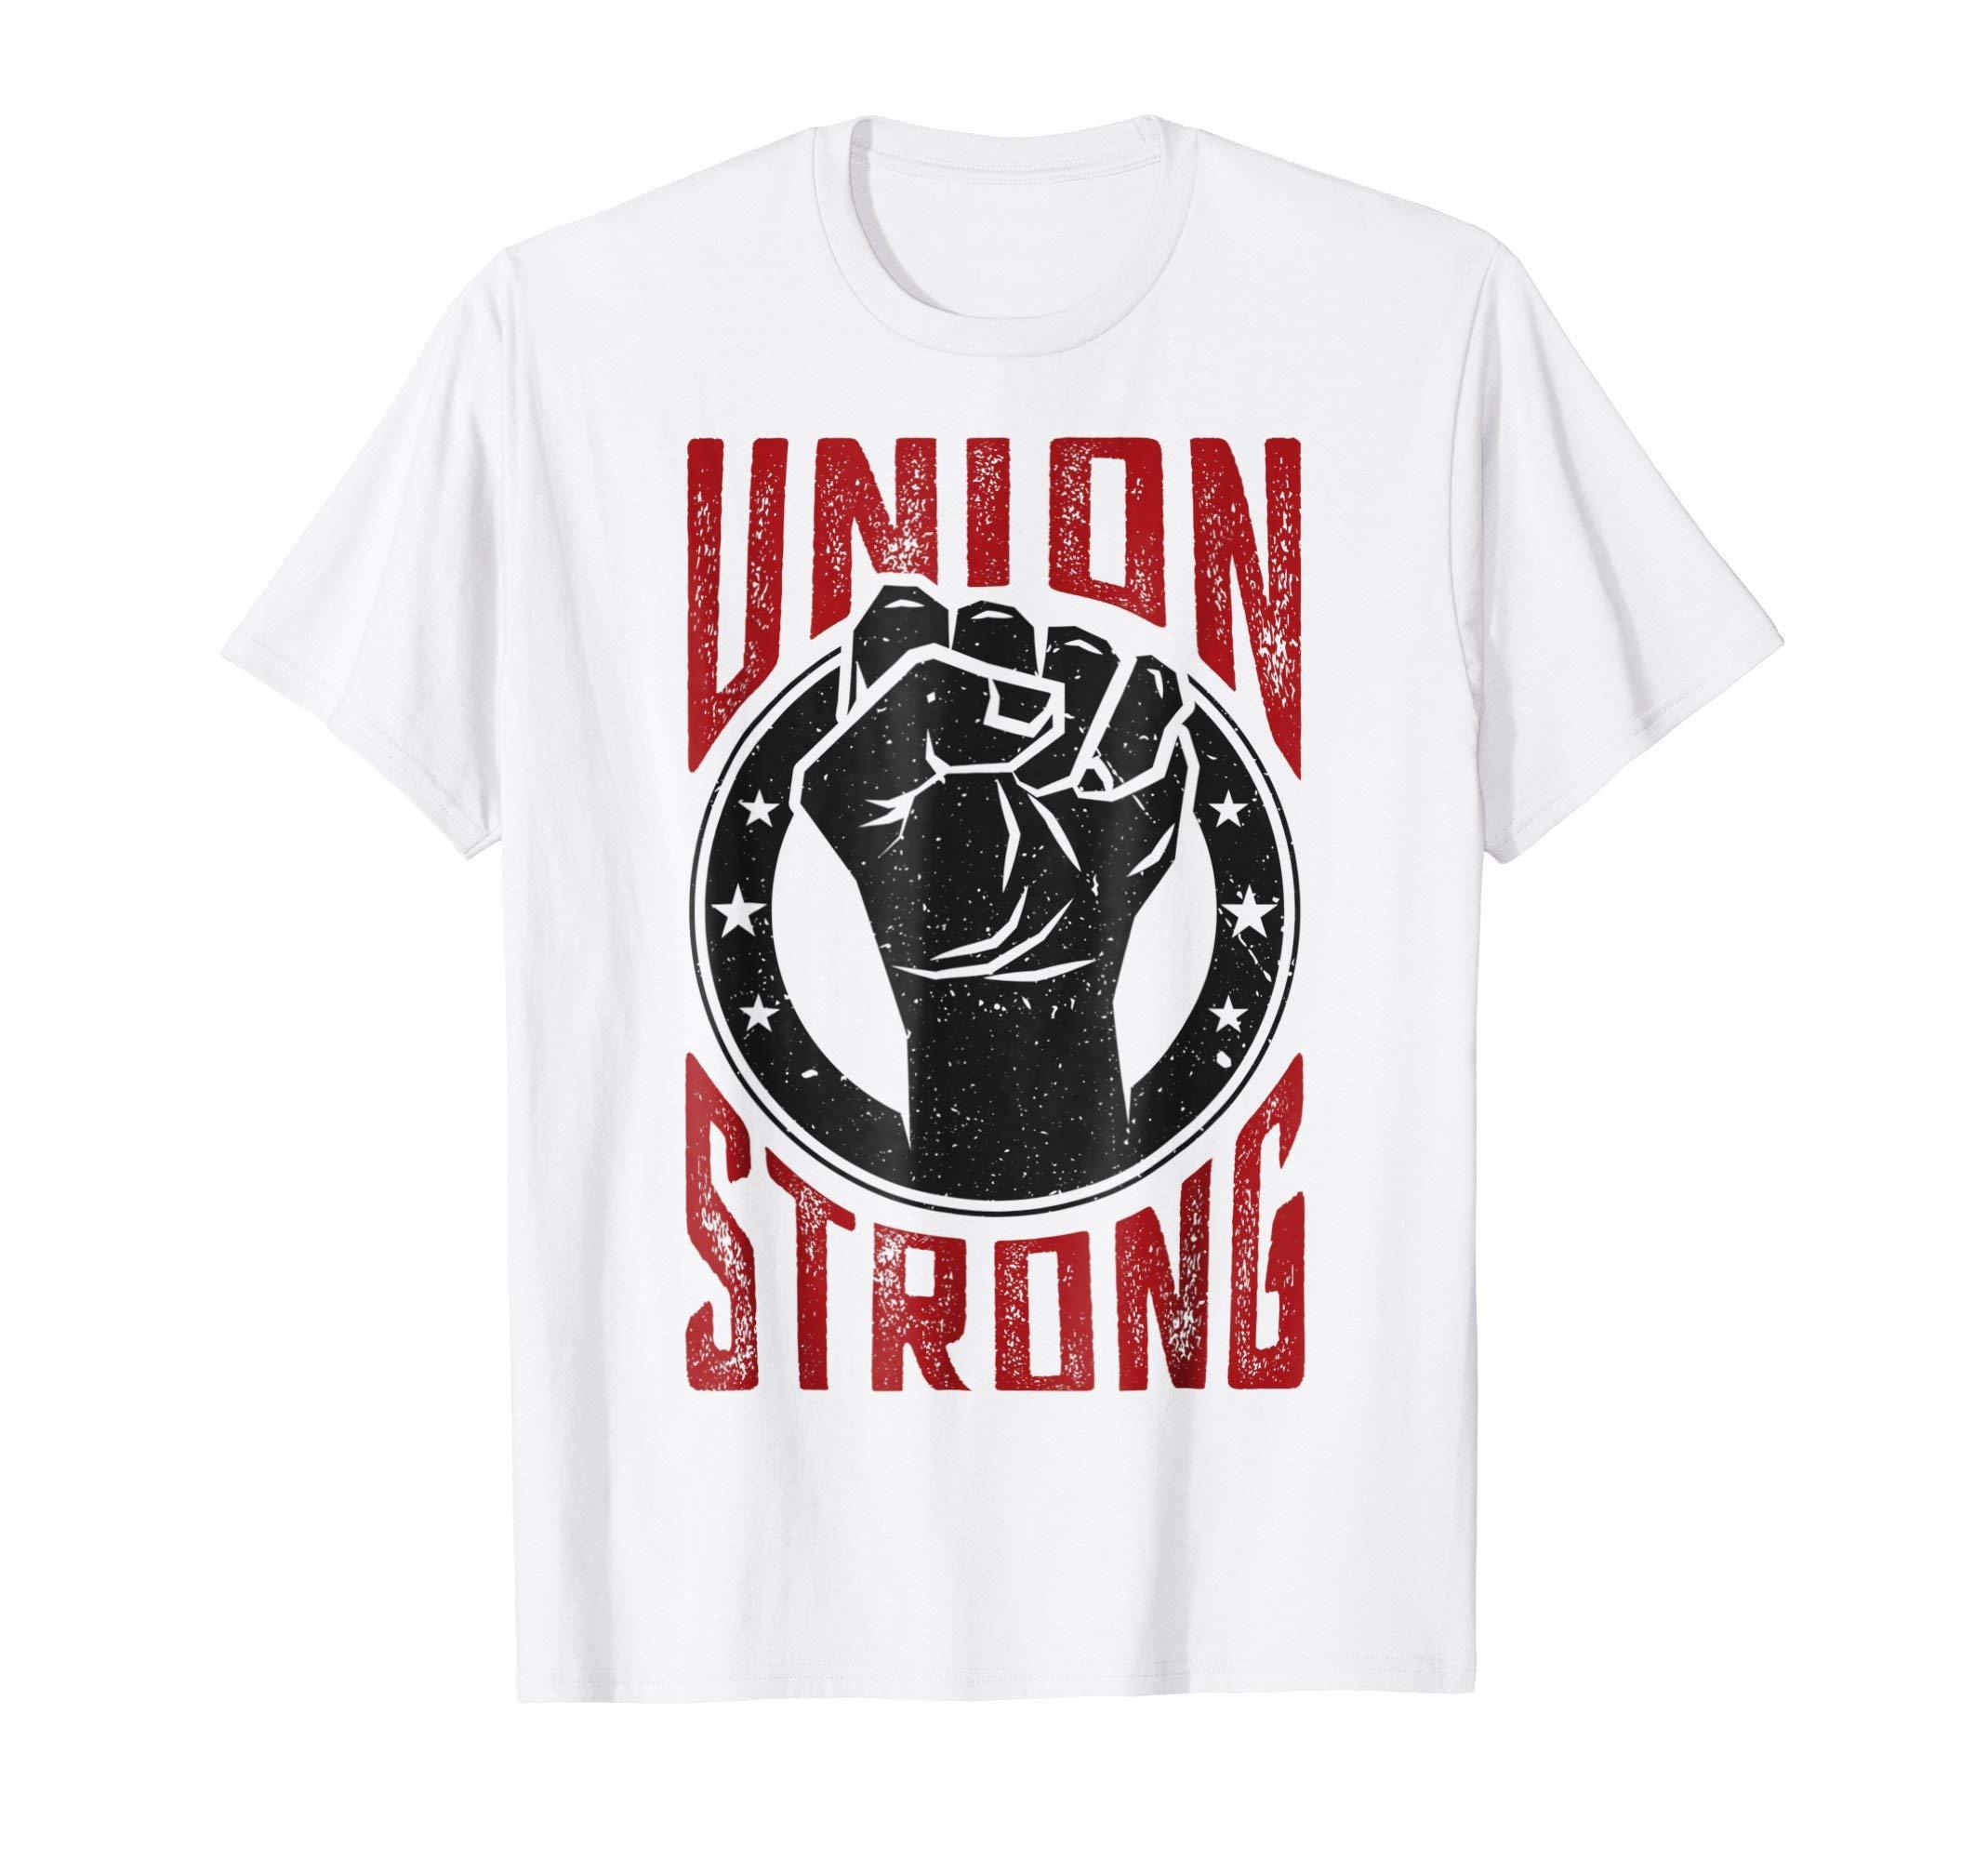 2a0b6da2feca84 Union Strong | Pro-Union Worker | Labor Union Protest Shirt